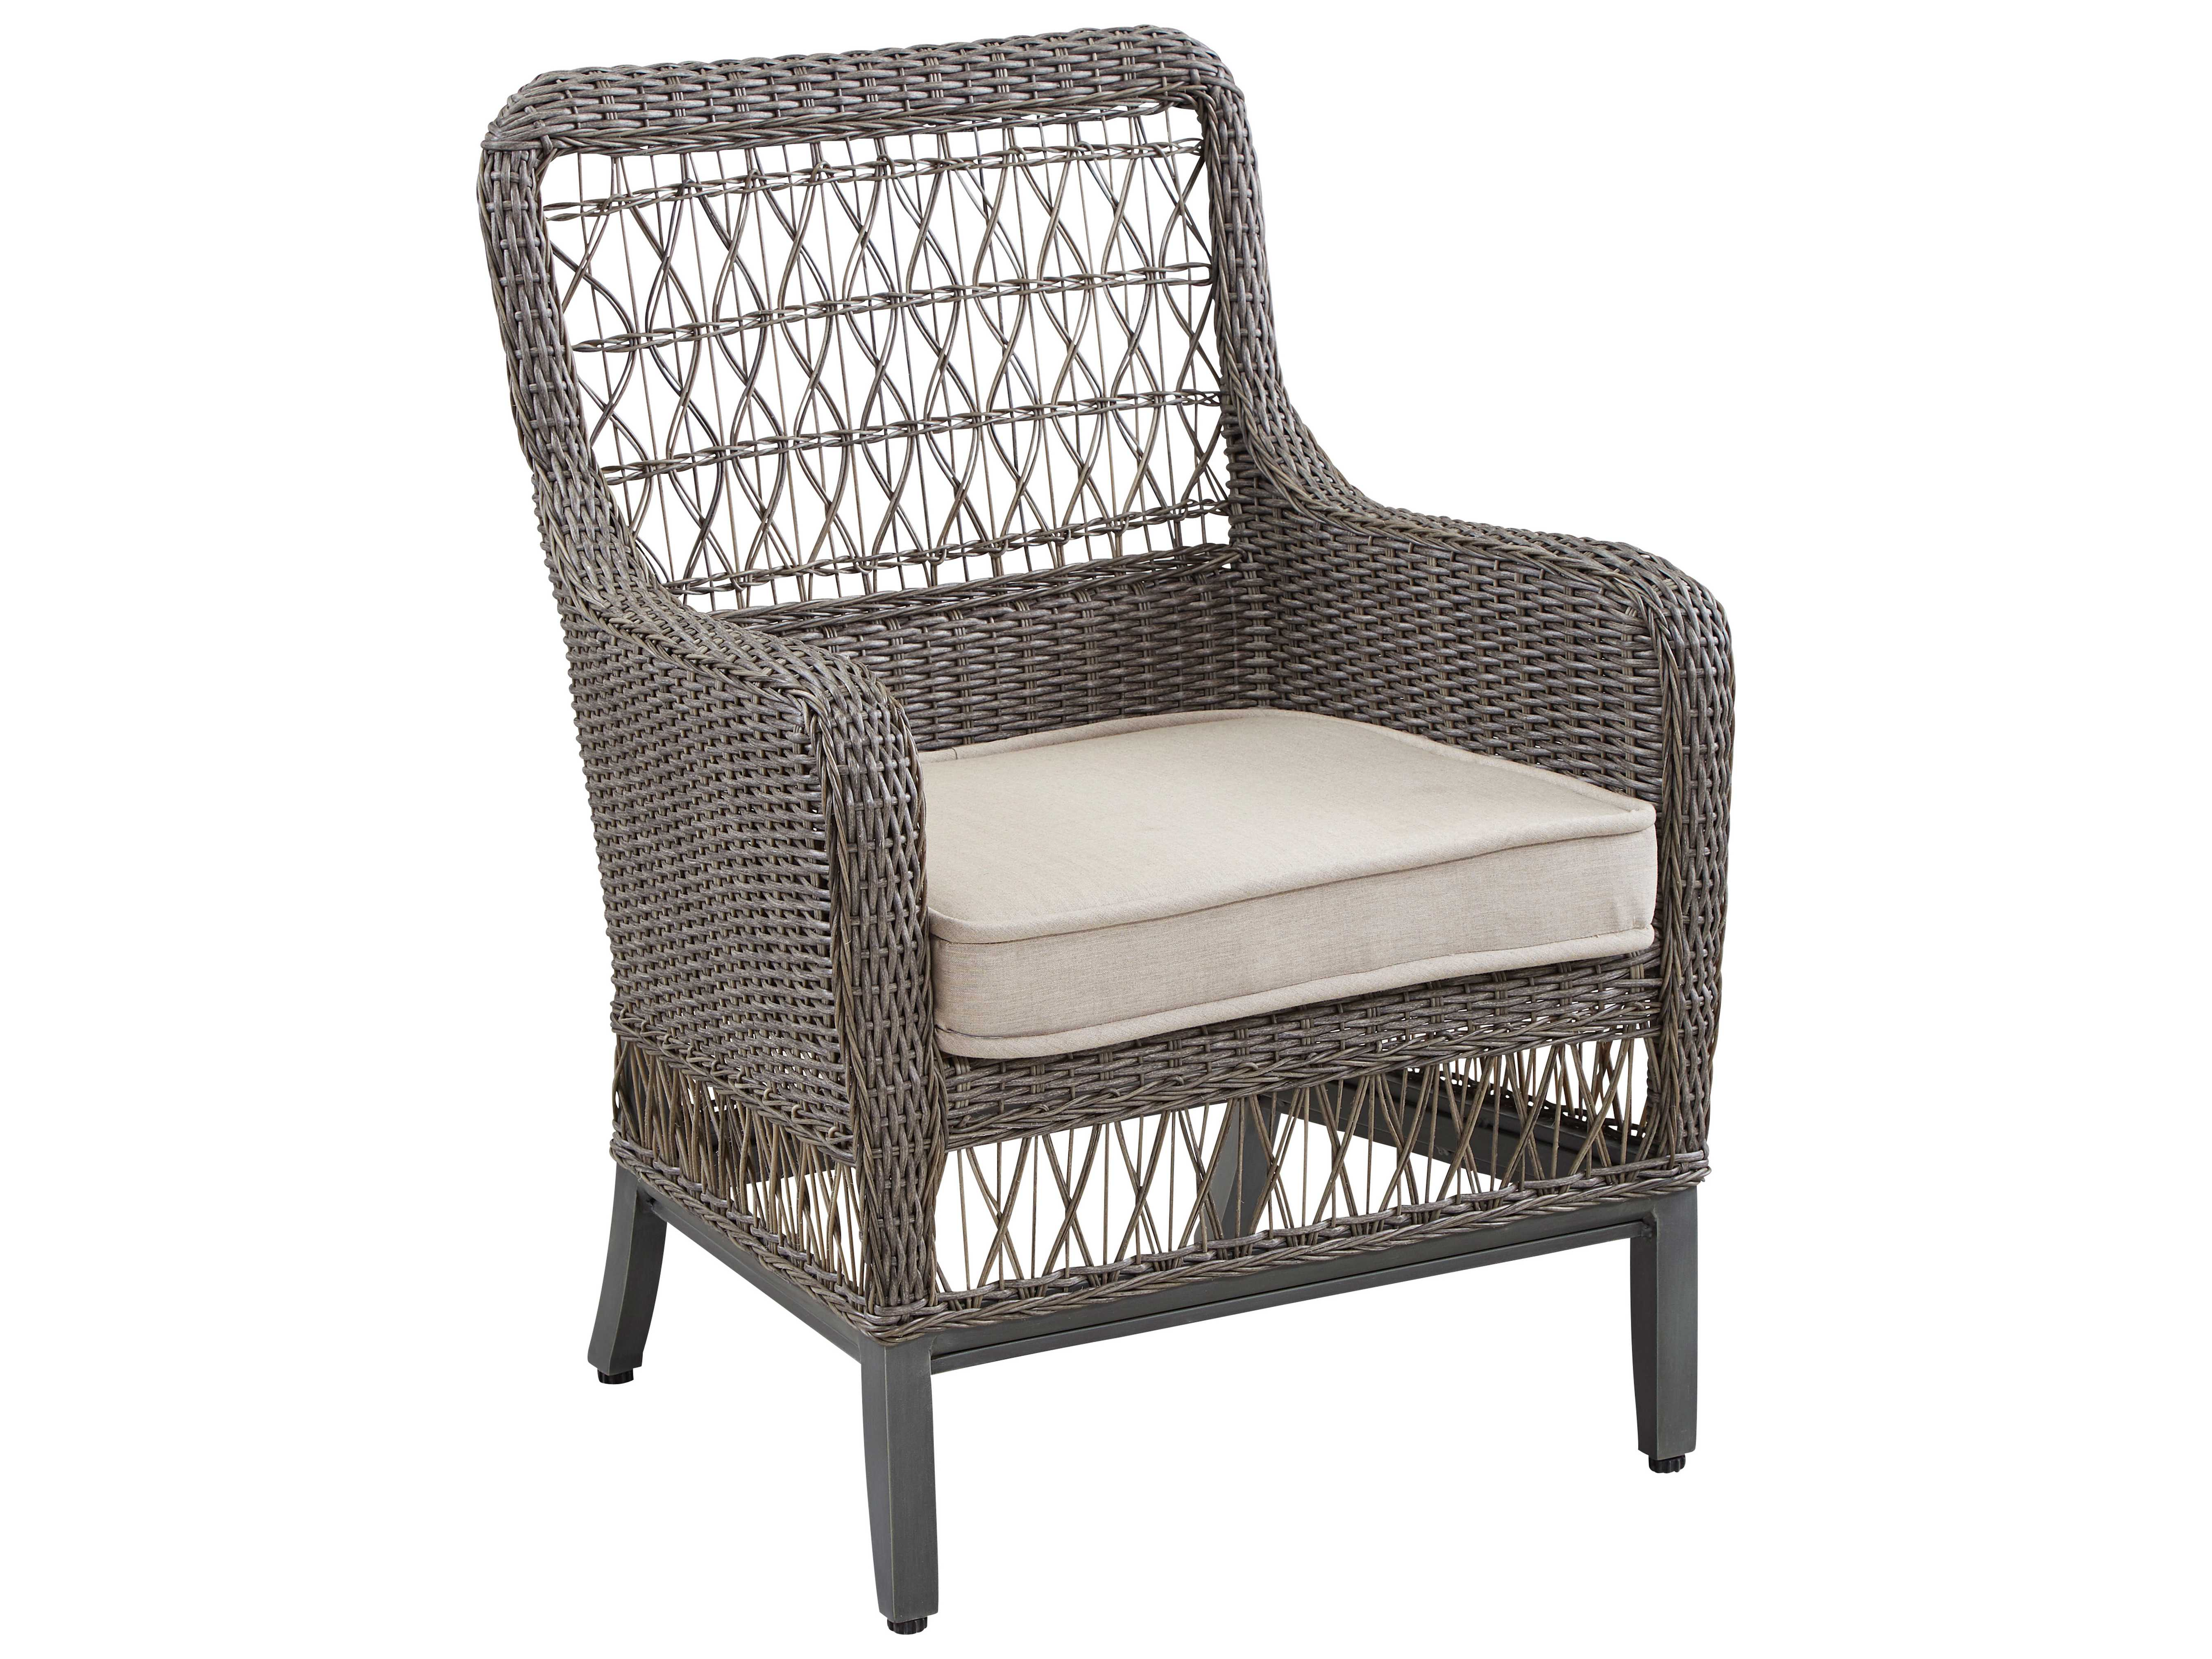 paula deen dogwood dining chairs eddie bauer wooden high chair recall outdoor wicker stacking arm